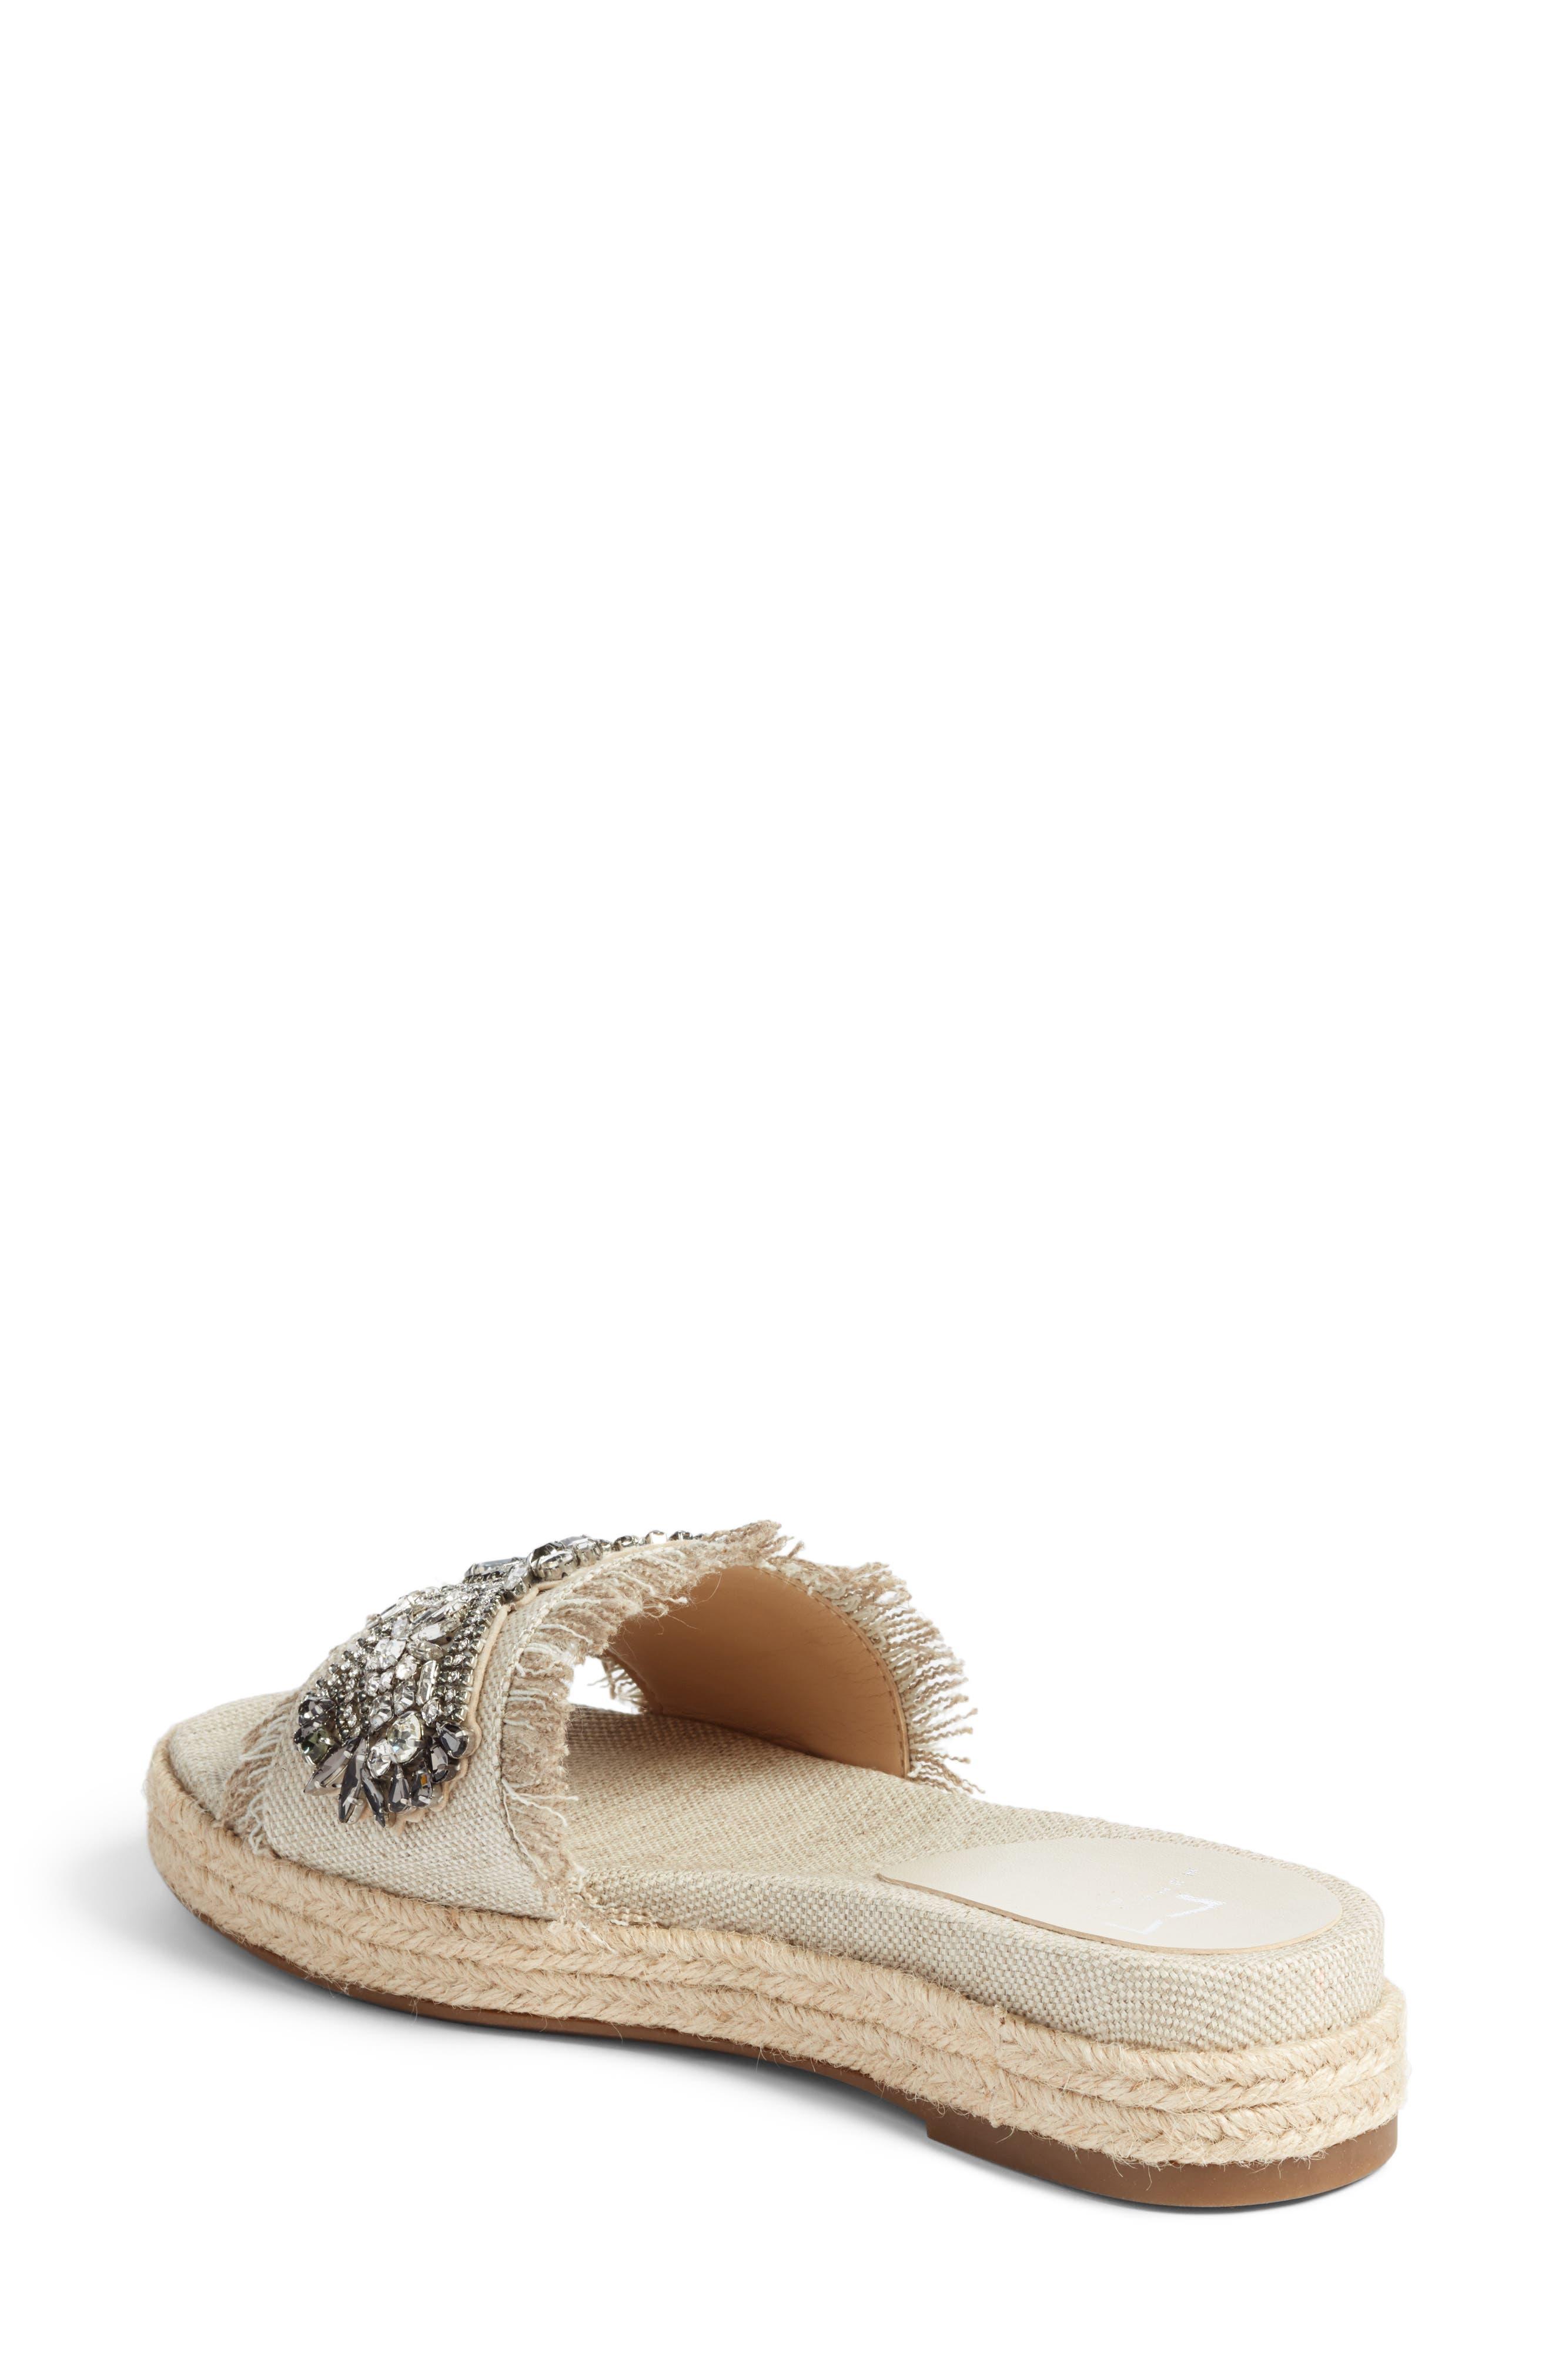 Alternate Image 2  - Marc Fisher LTD Jelly II Embellished Sandal (Women)